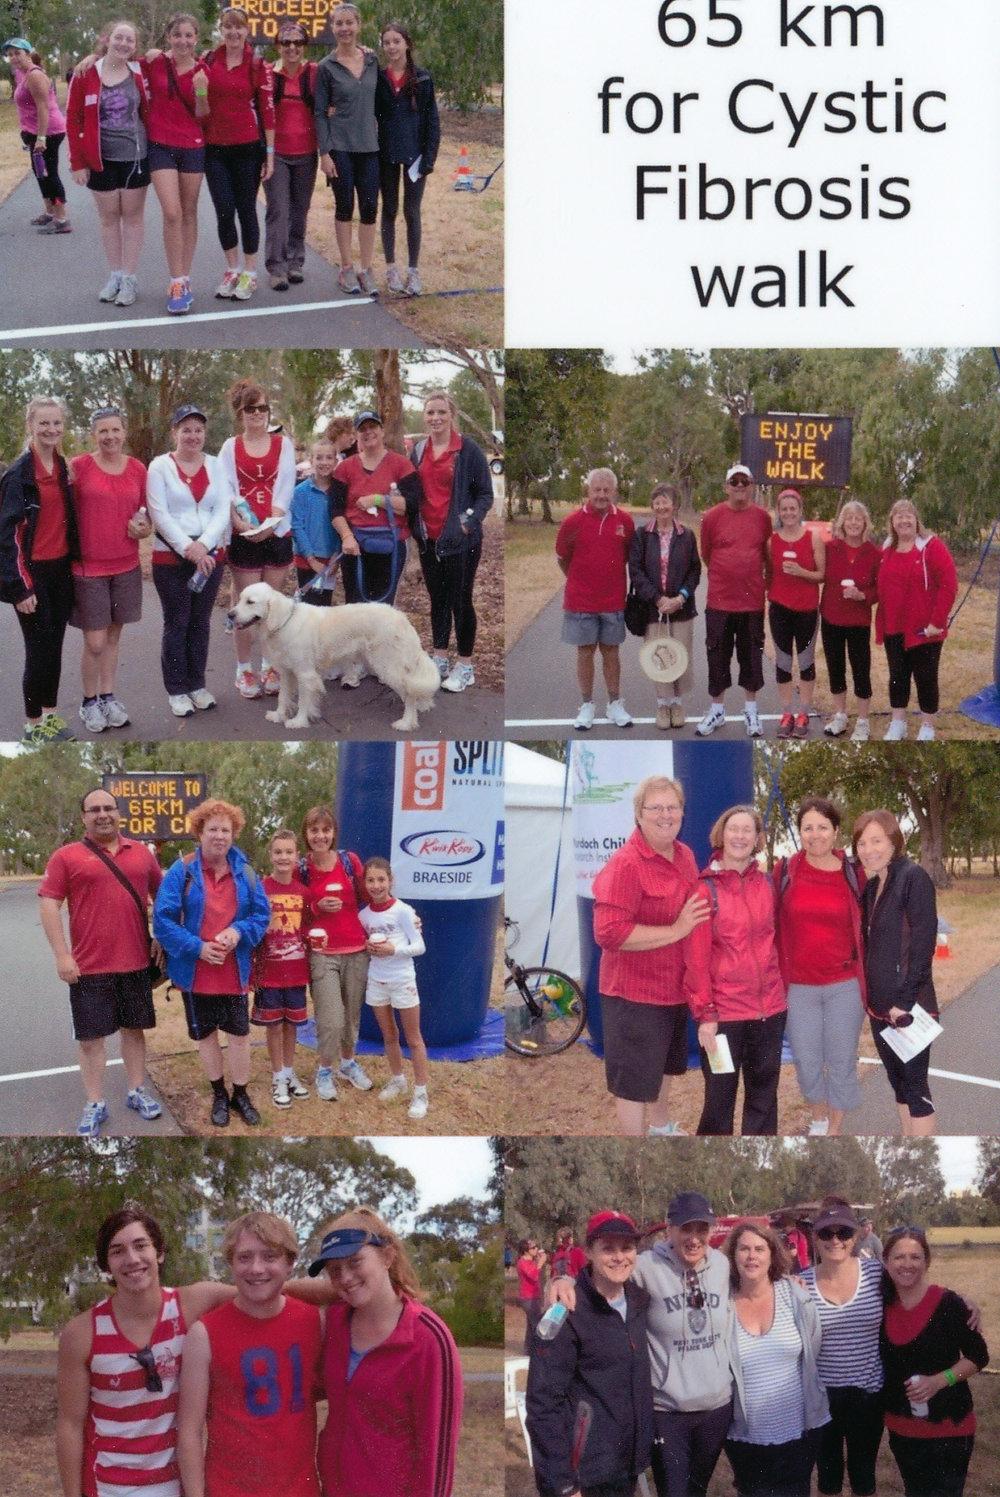 65km for Cystic Fibrosis GEN teams 2014.jpg